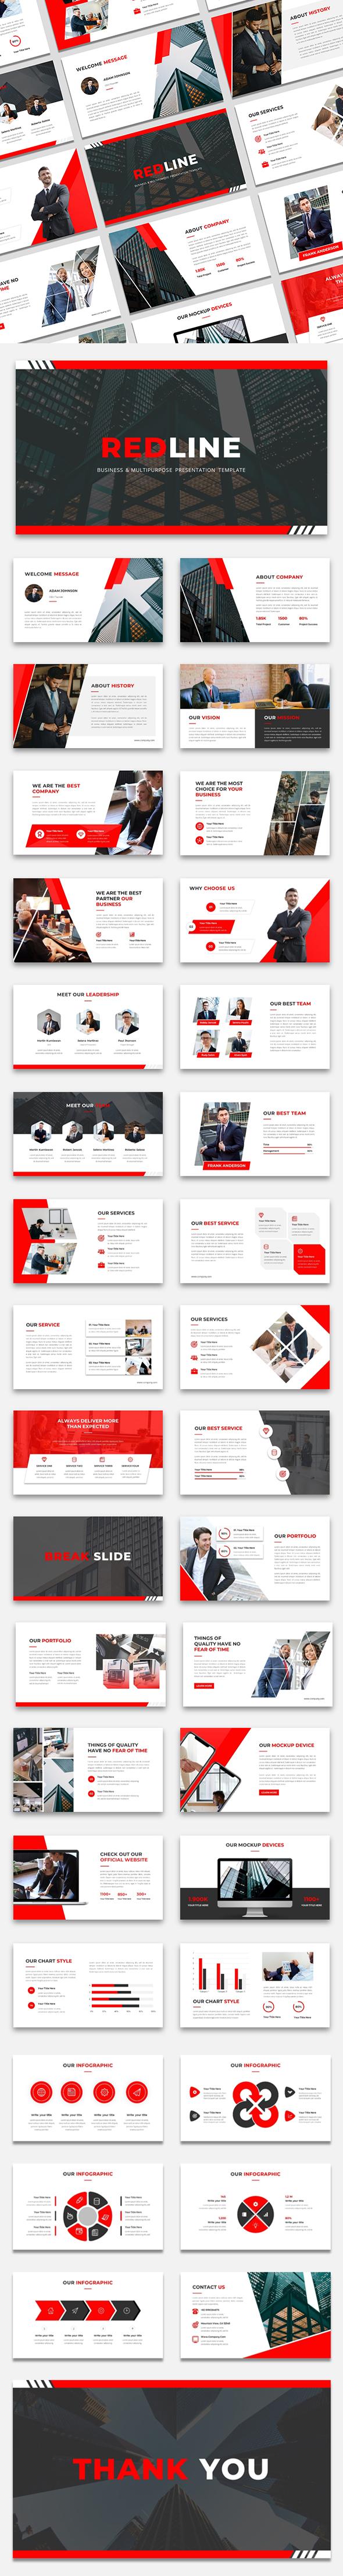 REDLINE - Busines & Multiporpose Keynote Presentation Template